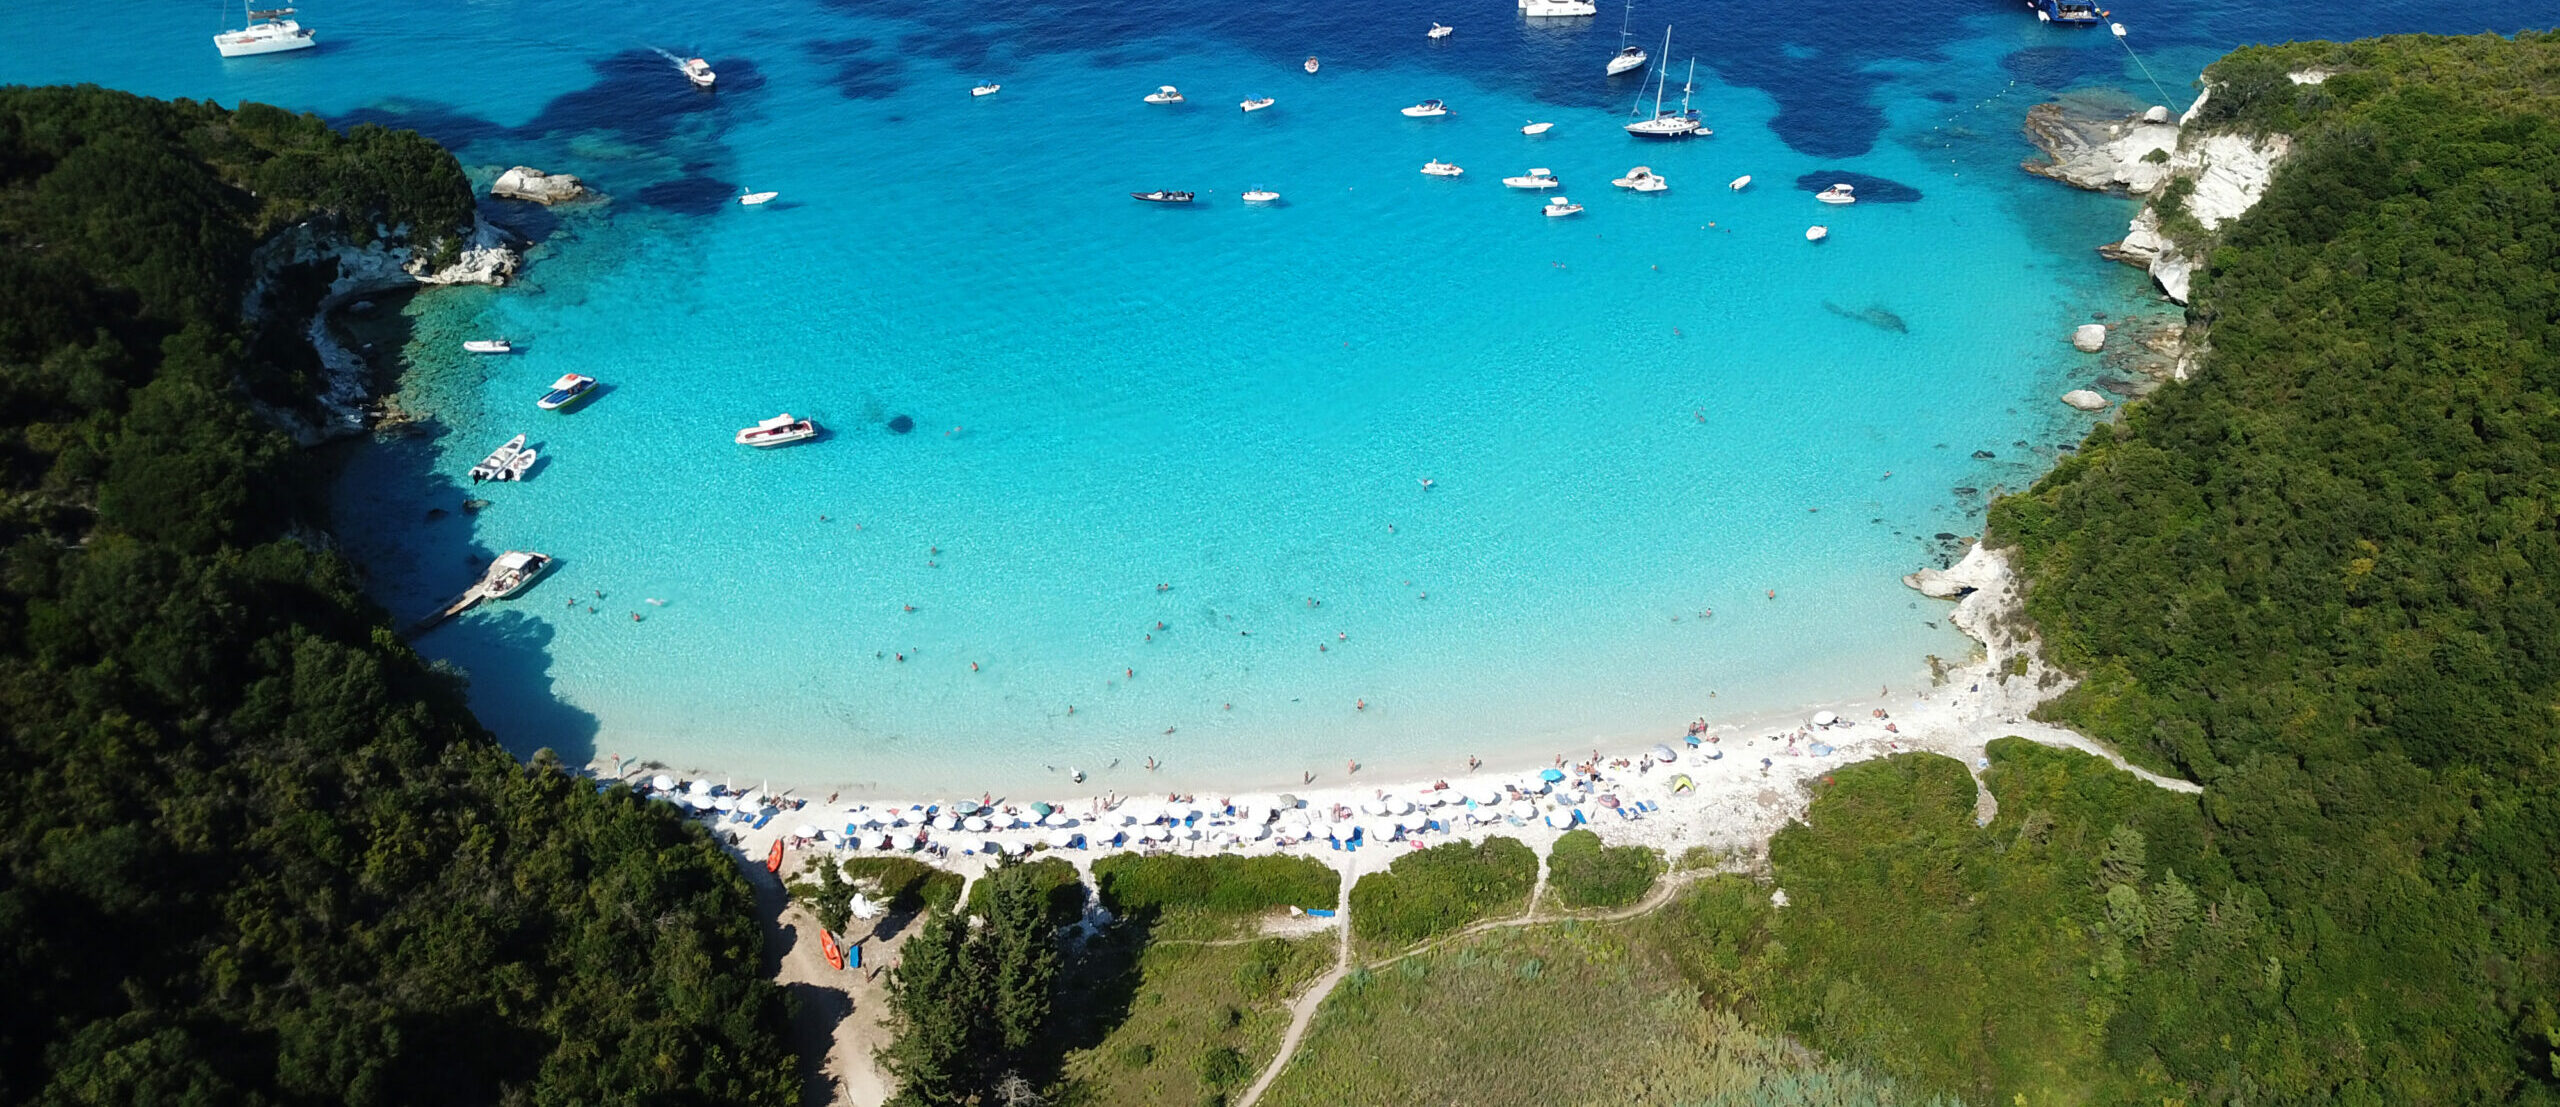 Five Greek beaches with Caribbean-like waters